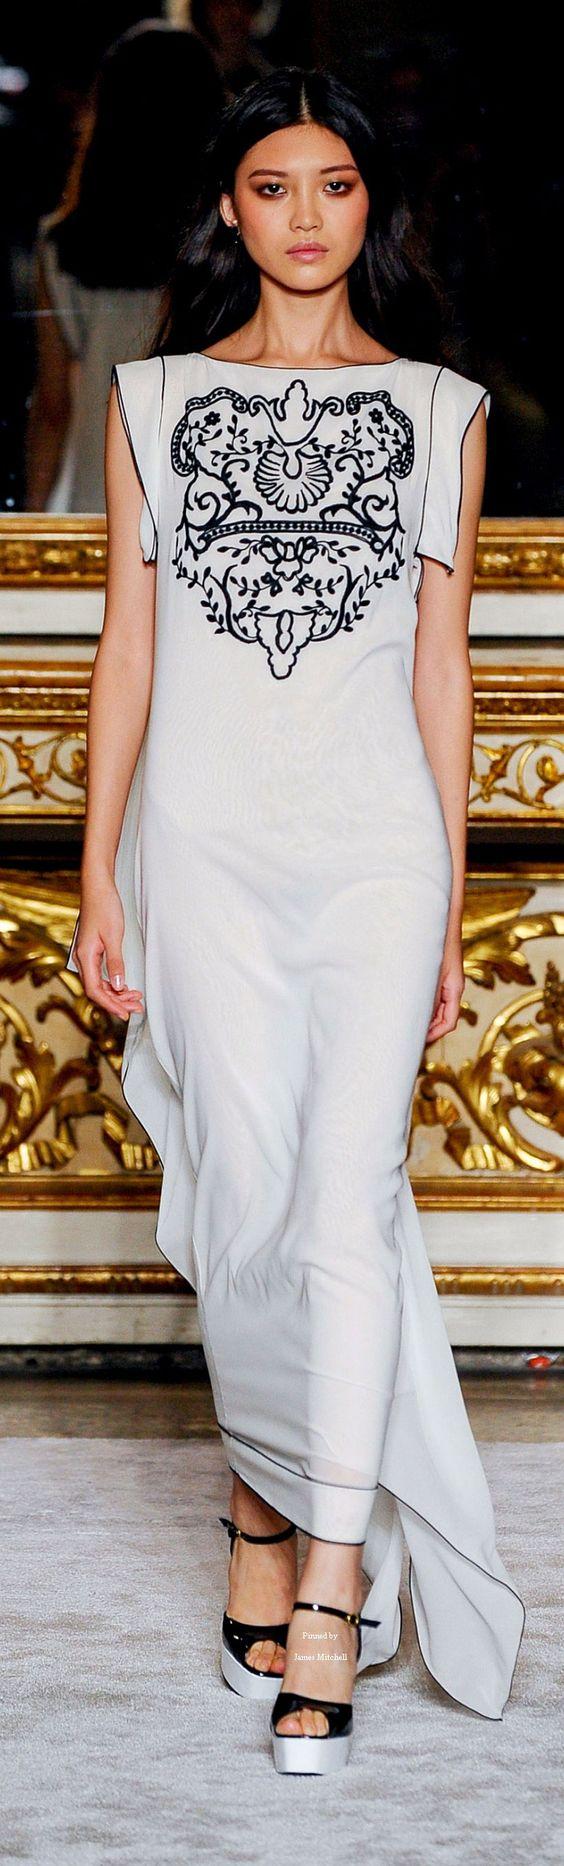 #Farbbberatung #Stilberatung #Farbenreich mit www.farben-reich.com Roccobarocco Collection Spring 2016 Ready-to-Wear